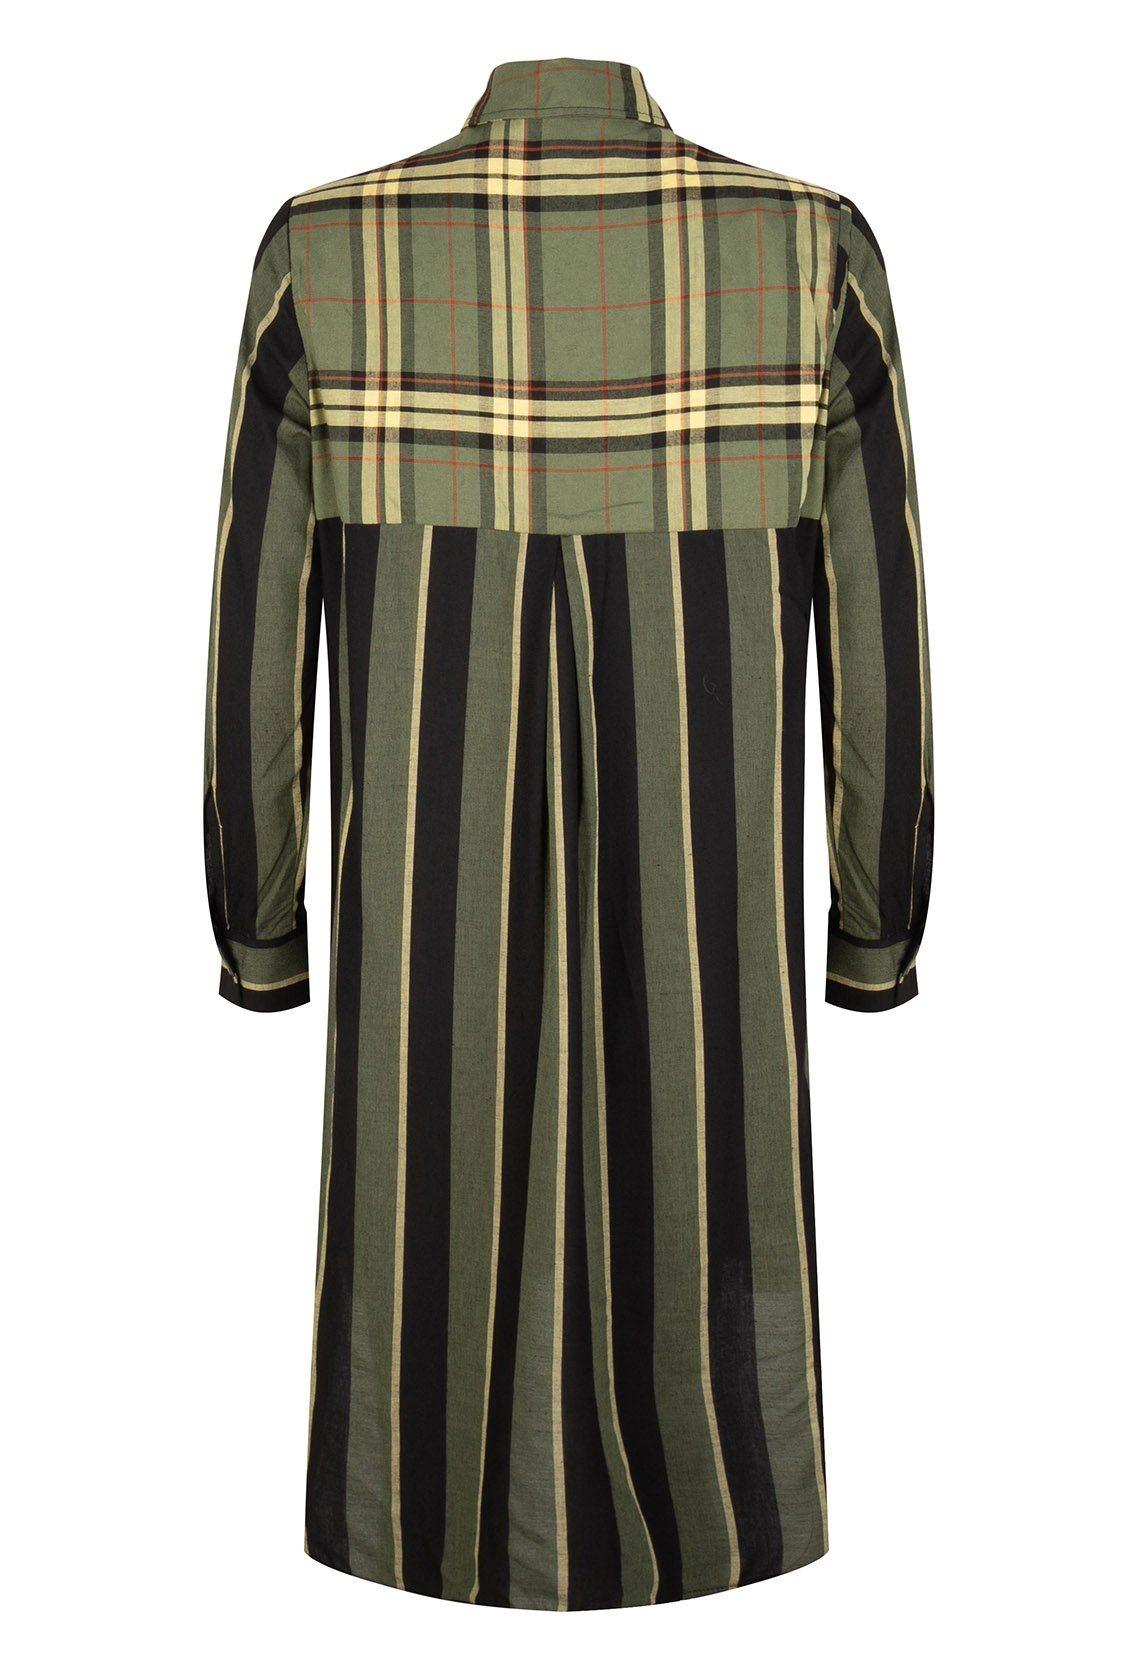 Oversized blouse dress